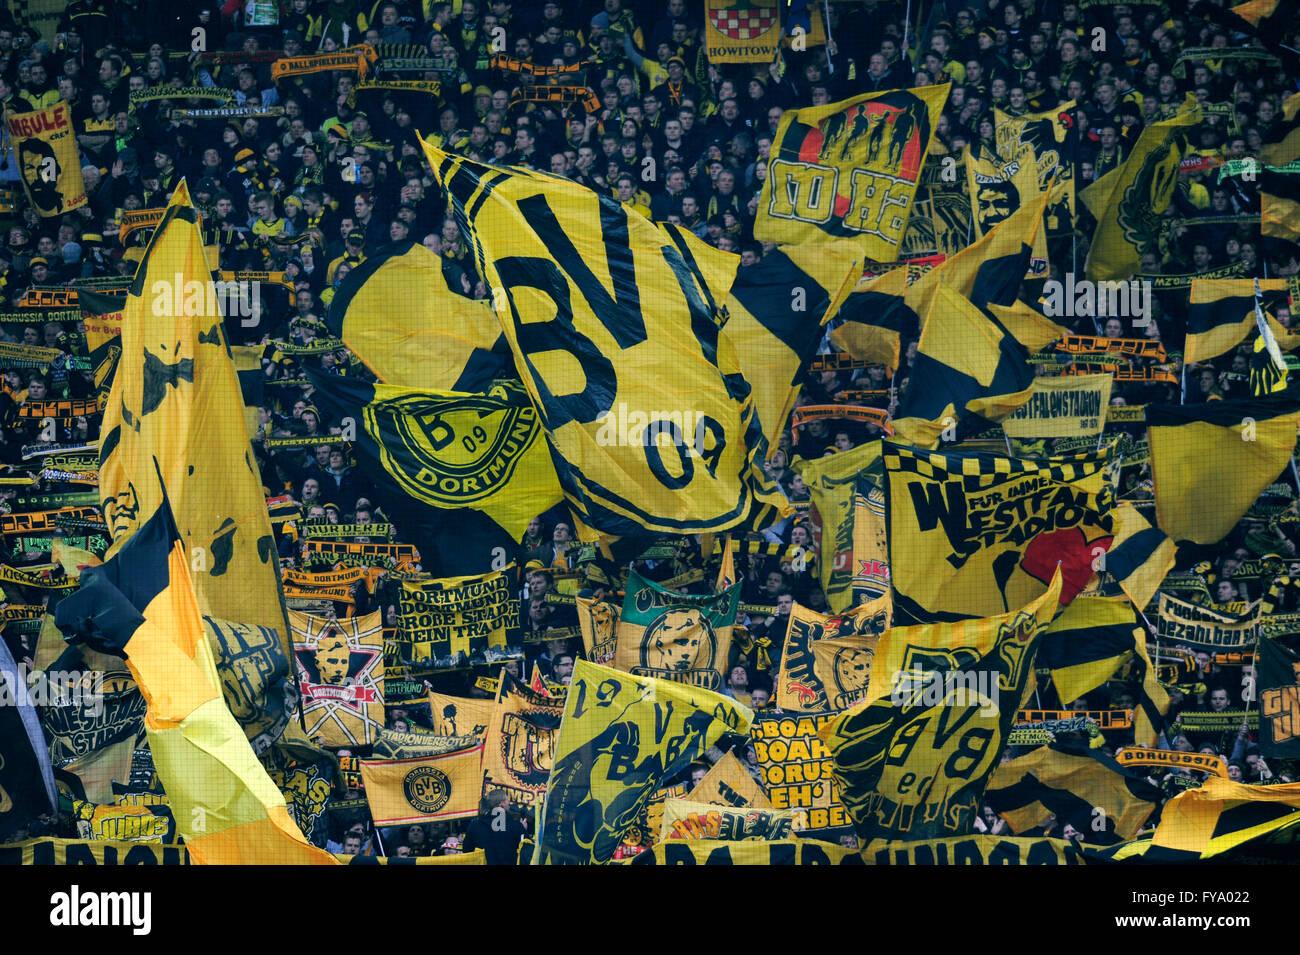 Borussia Dortmund Football Club Logo High Resolution Stock Photography And Images Alamy